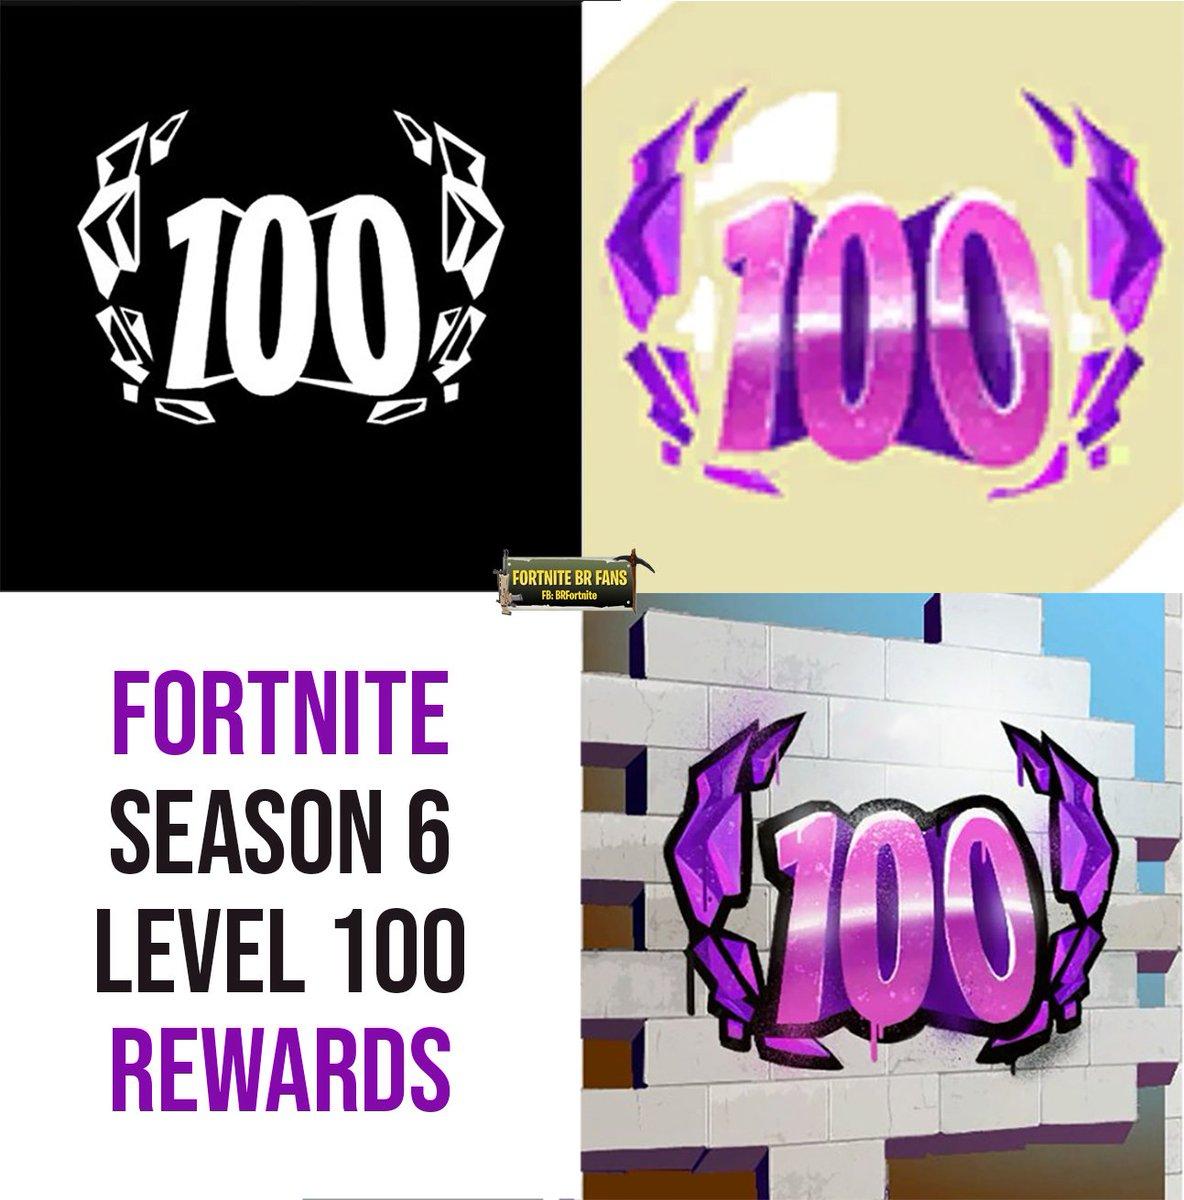 Fortnite Battle Royale Fans On Twitter Season 6 Level 100